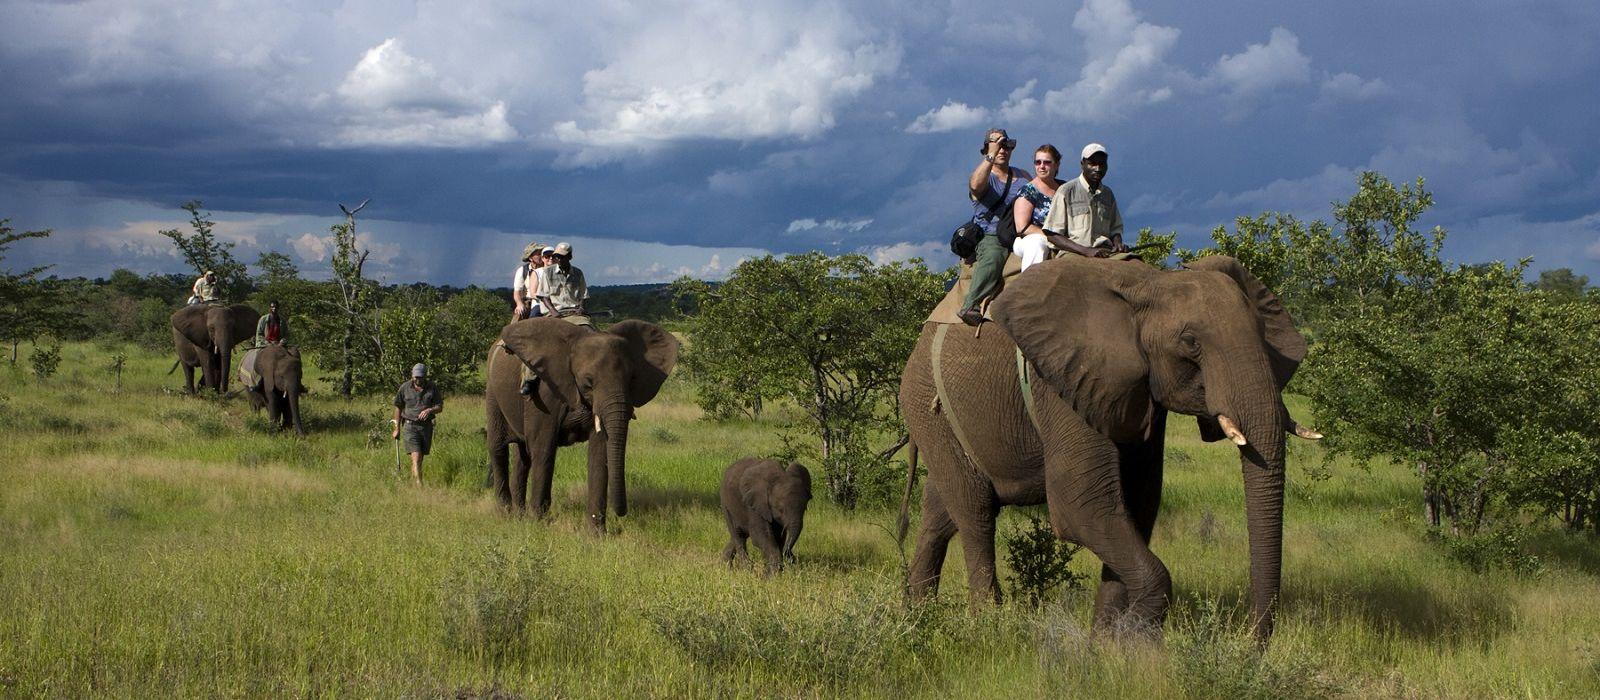 Selbstfahrer-Reise nach Südafrika, Namibia & Simbabwe: Nord Kap via Caprivi und Viktoriafälle Urlaub 6